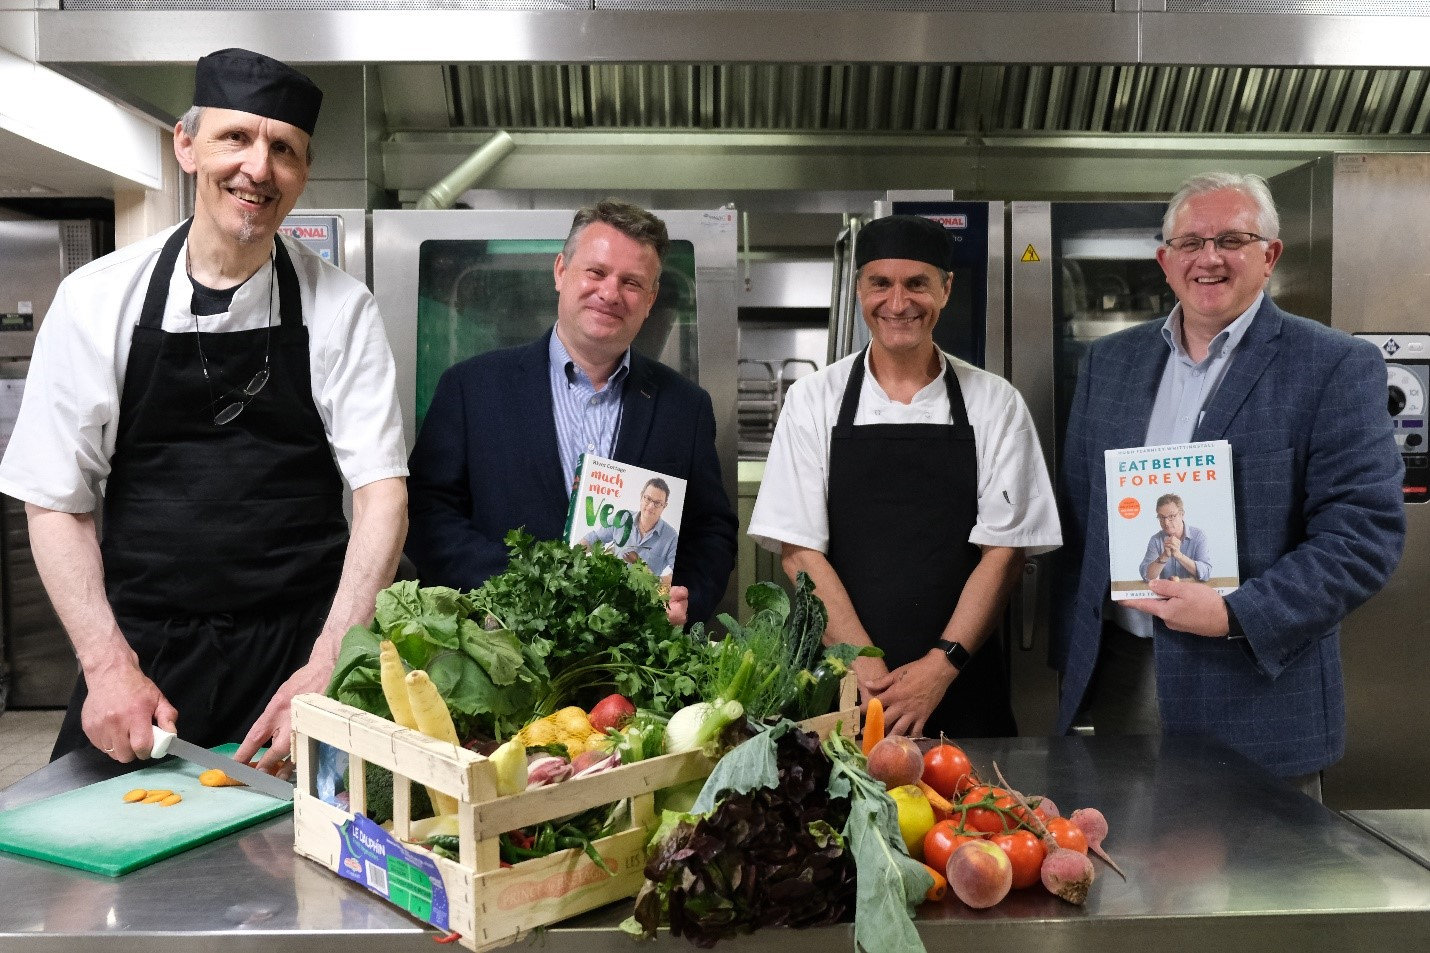 The catering team receiving the Peas Please Rising Star award. Credit: Ian Macaulay